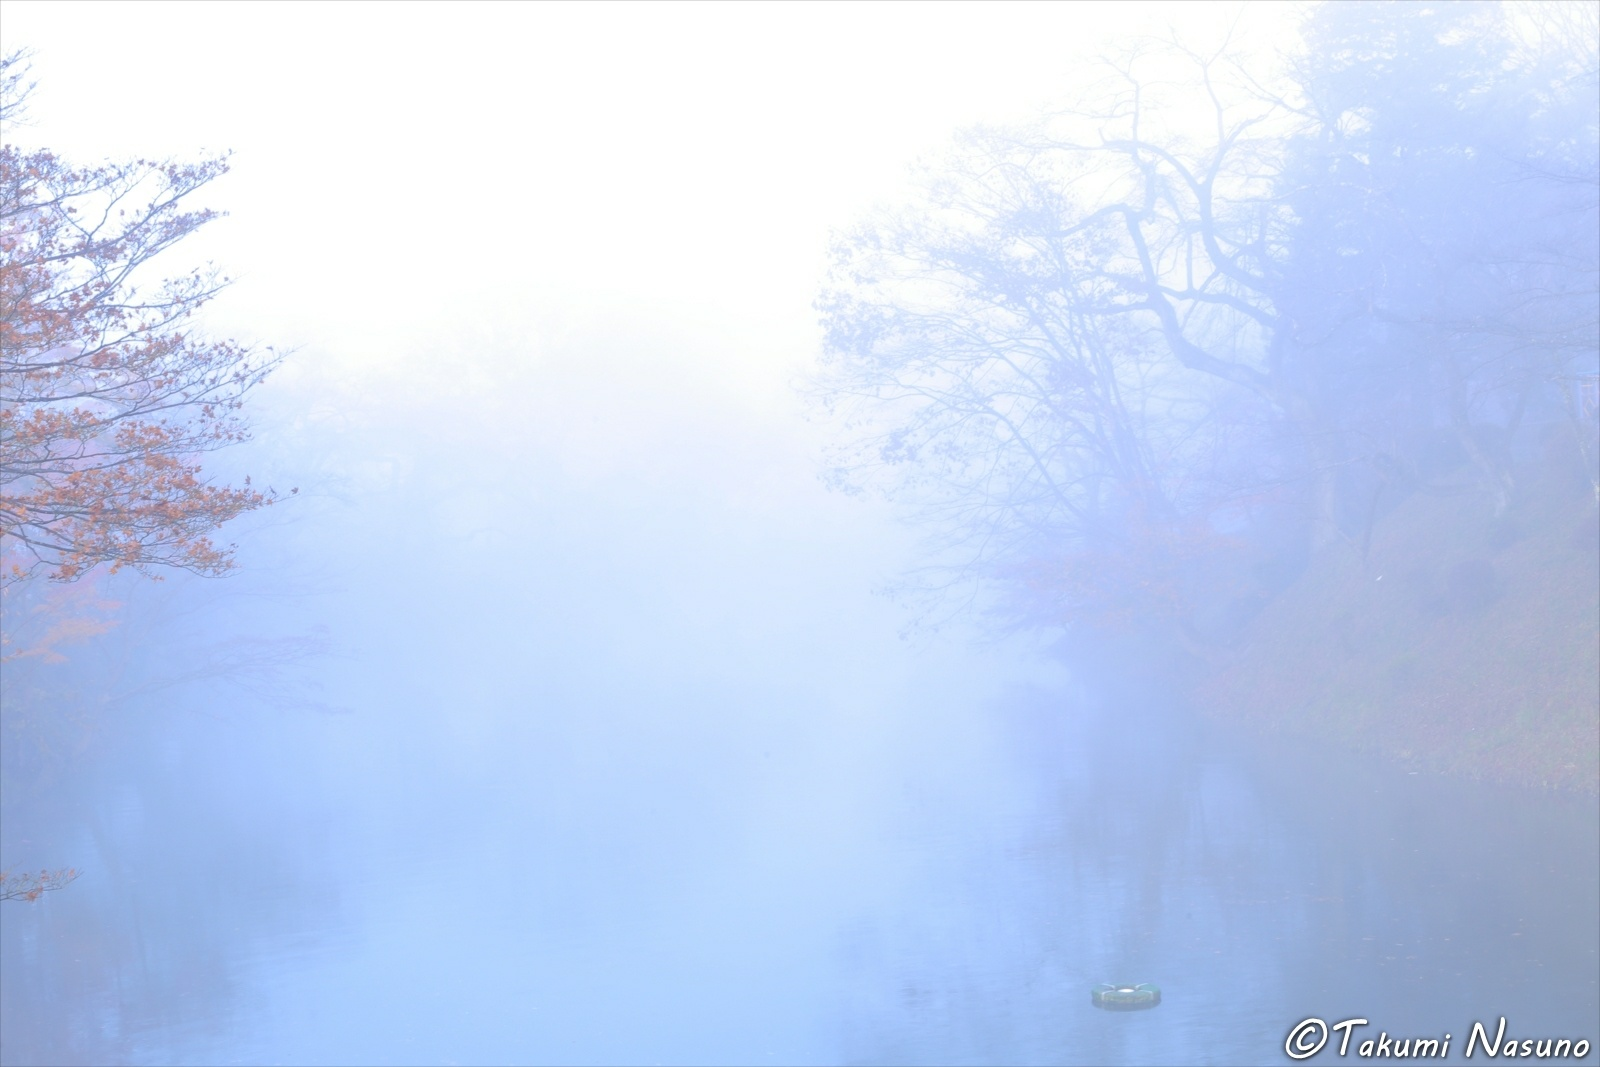 Morning Mist around Site of Tanagura Castle